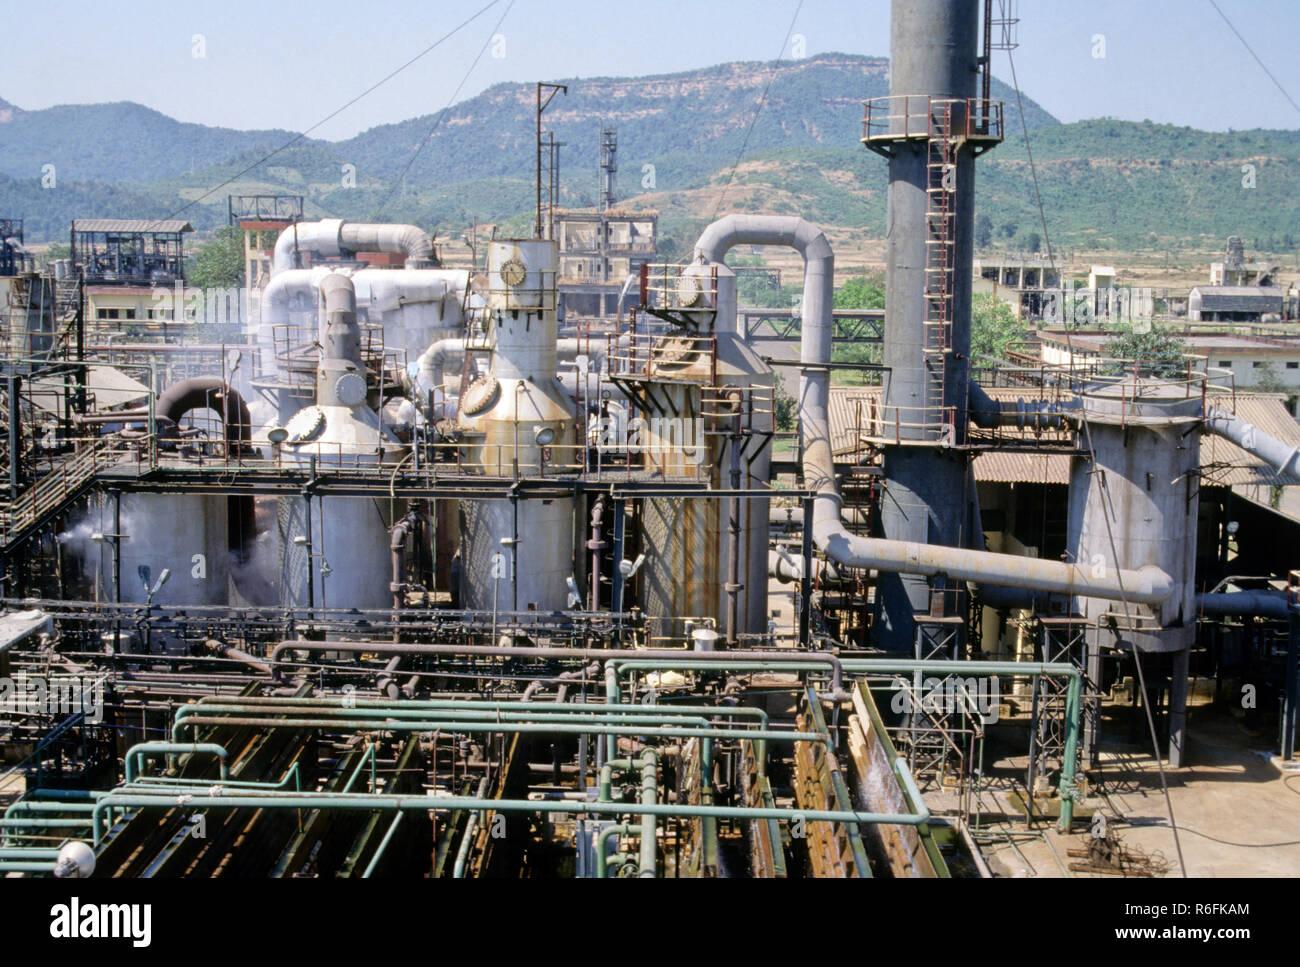 Hindustan Organic Chemicals Factory, india - Stock Image